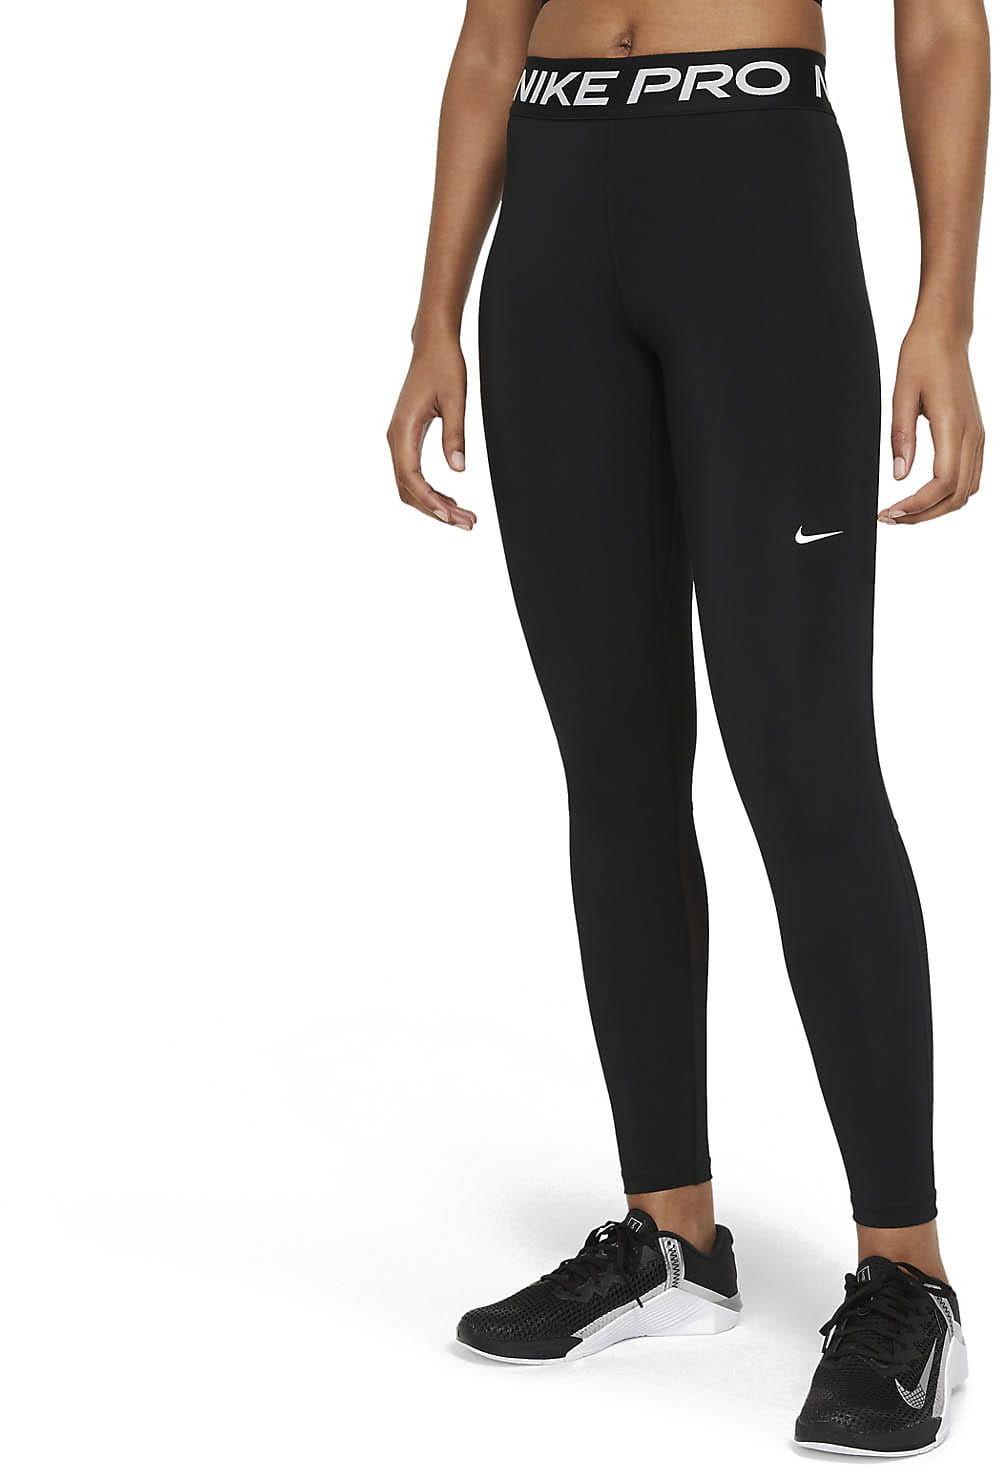 Legginsy damskie spodnie Nike rozm S 163cm